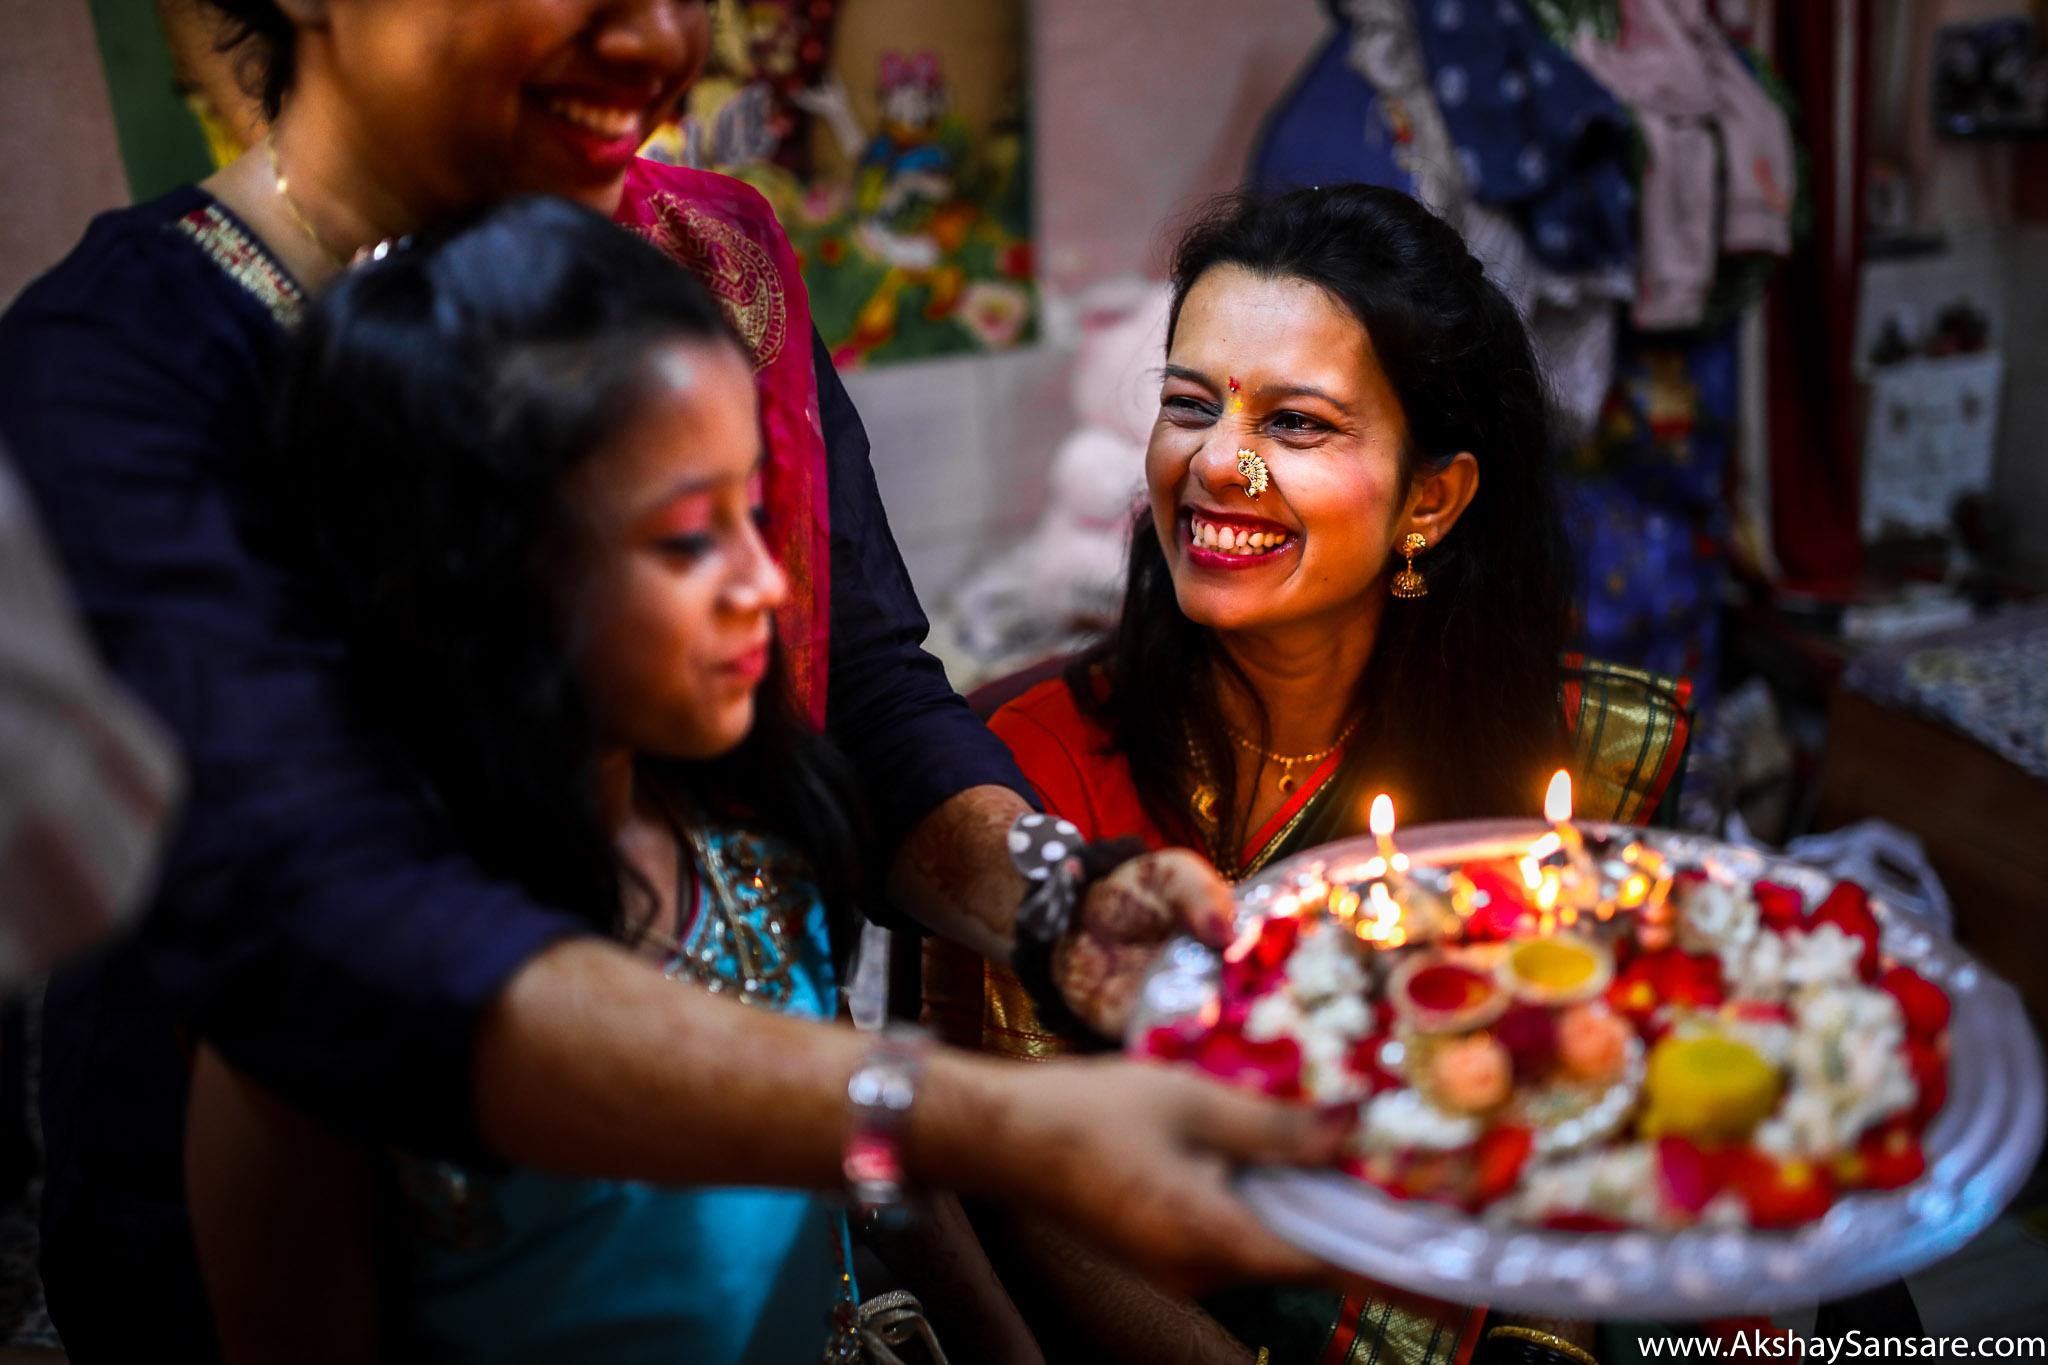 Aditya x Poonam Blog Akshay Sansare Photography Candid Photographer in Mumbai Best Cinematic wedding film filmer-7.jpg